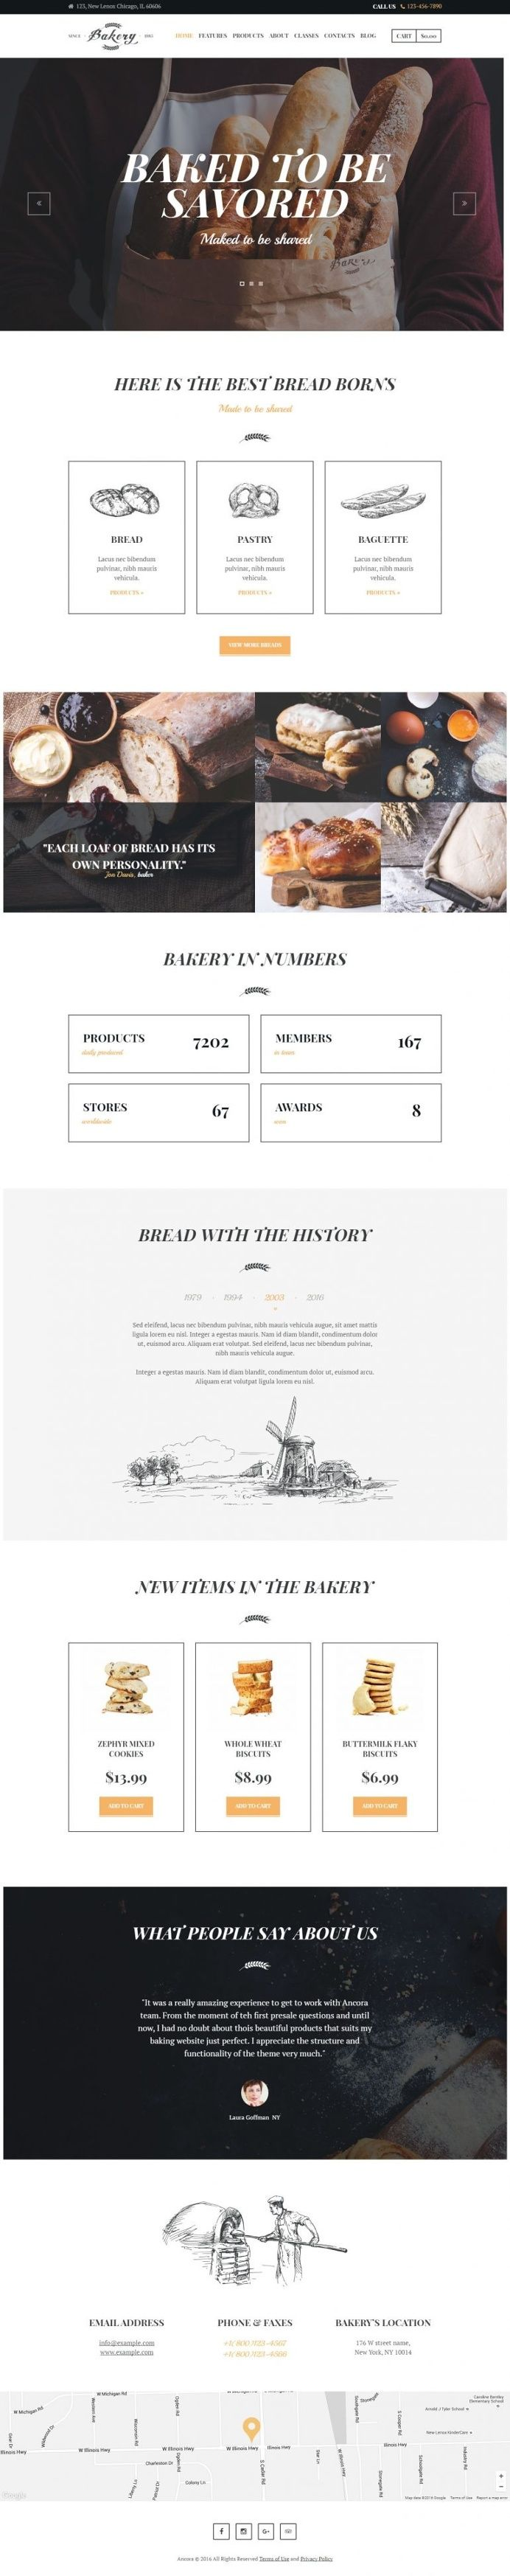 Bakery, Cafe & Bread Shop in Web design